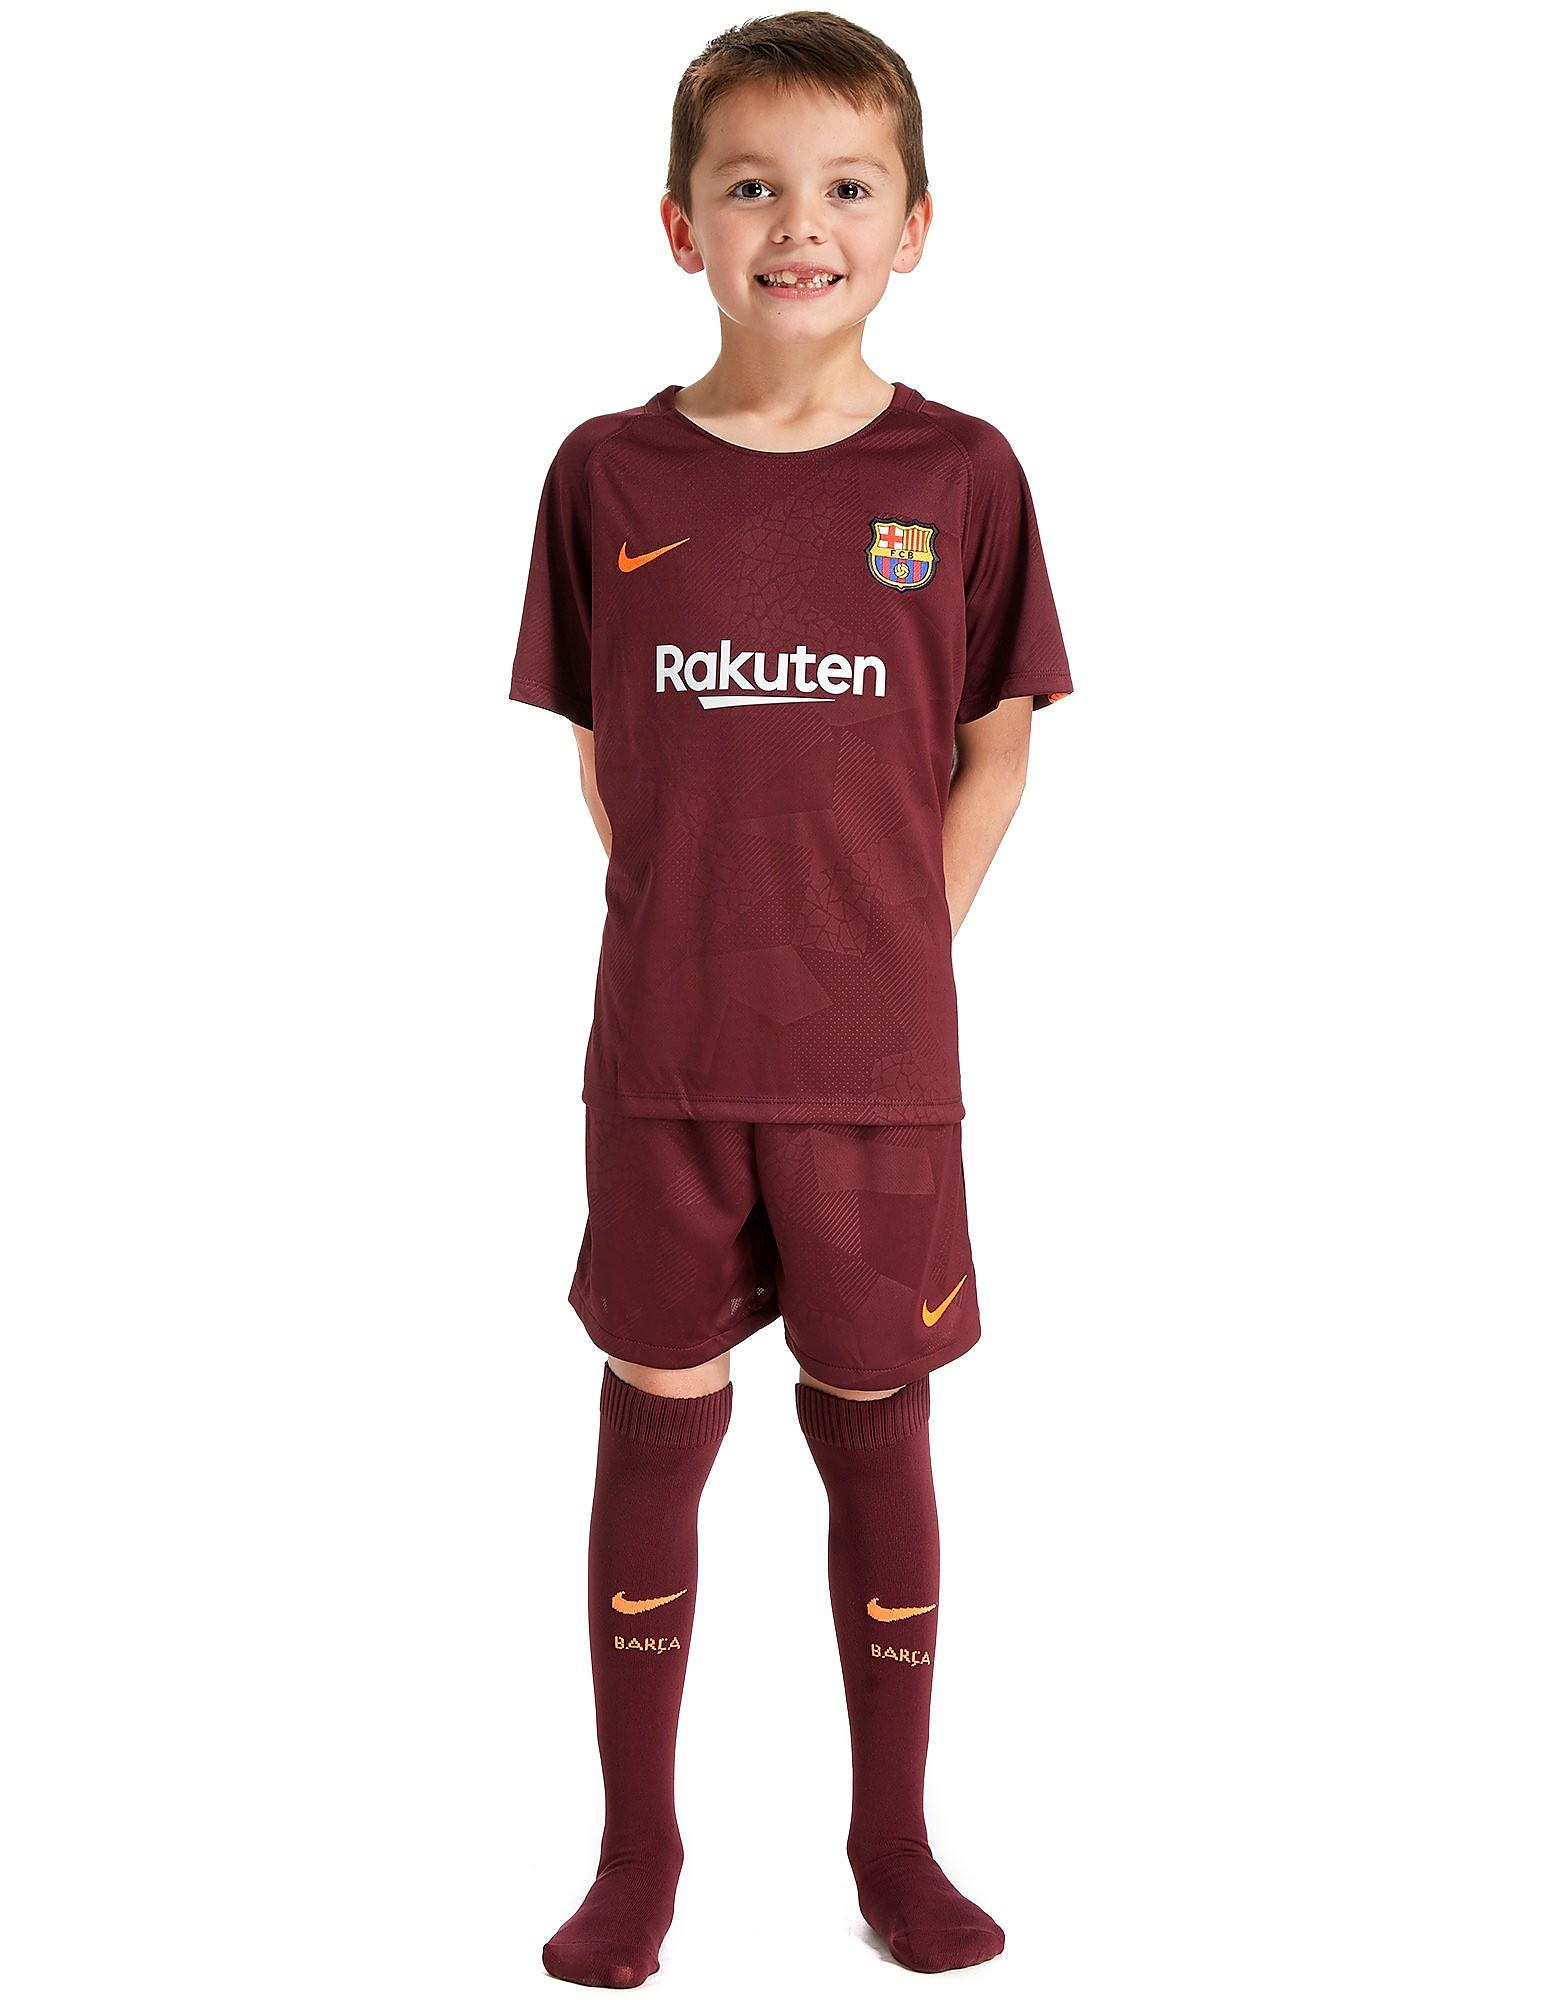 Nike Ensemble FC Barcelona 2017/18 Third Kit Enfant